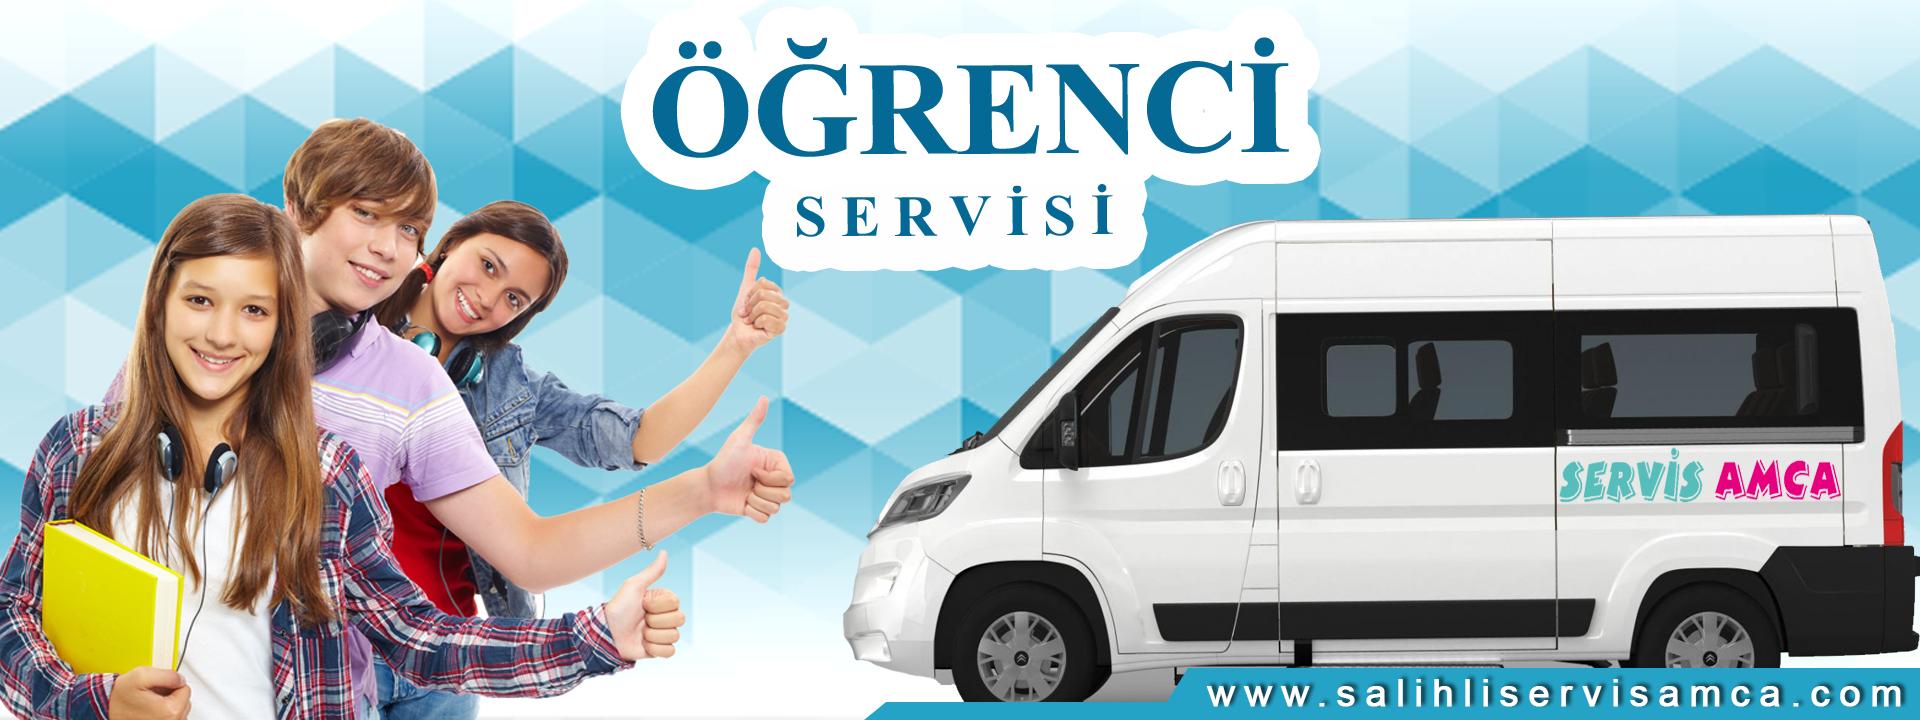 servis_amca_slide_ogrenci